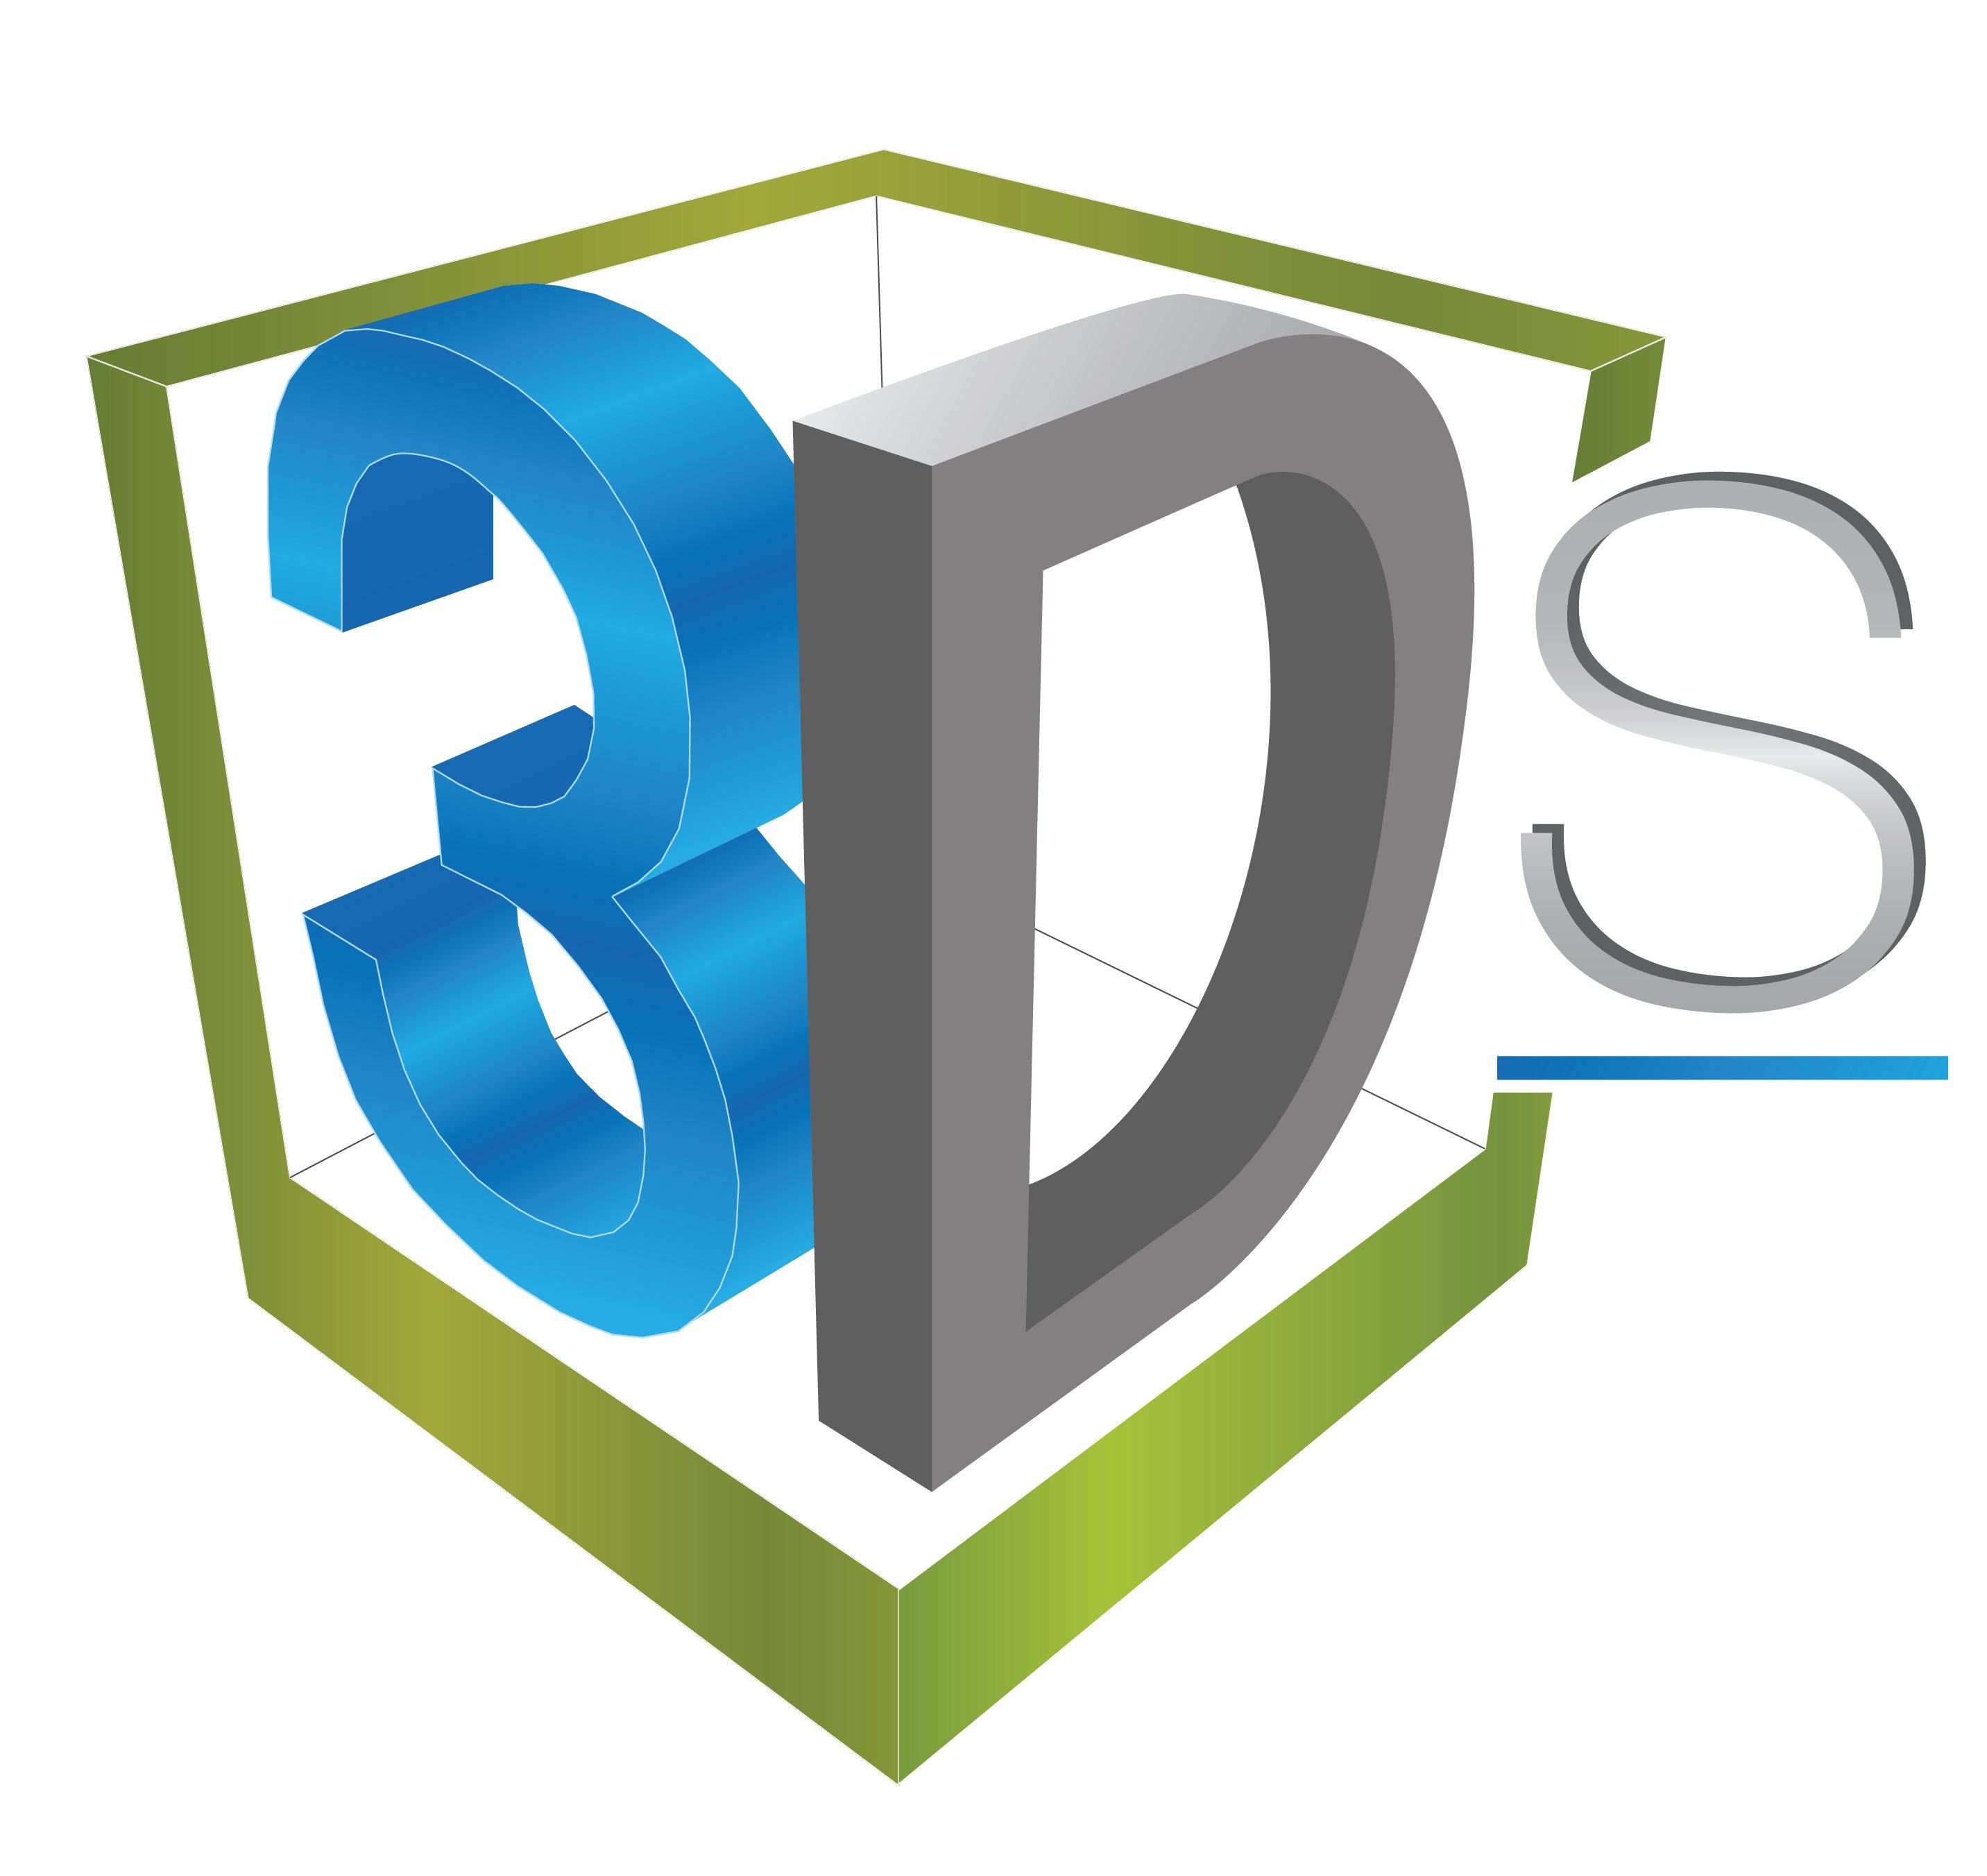 3D SOLUTIONS SAS